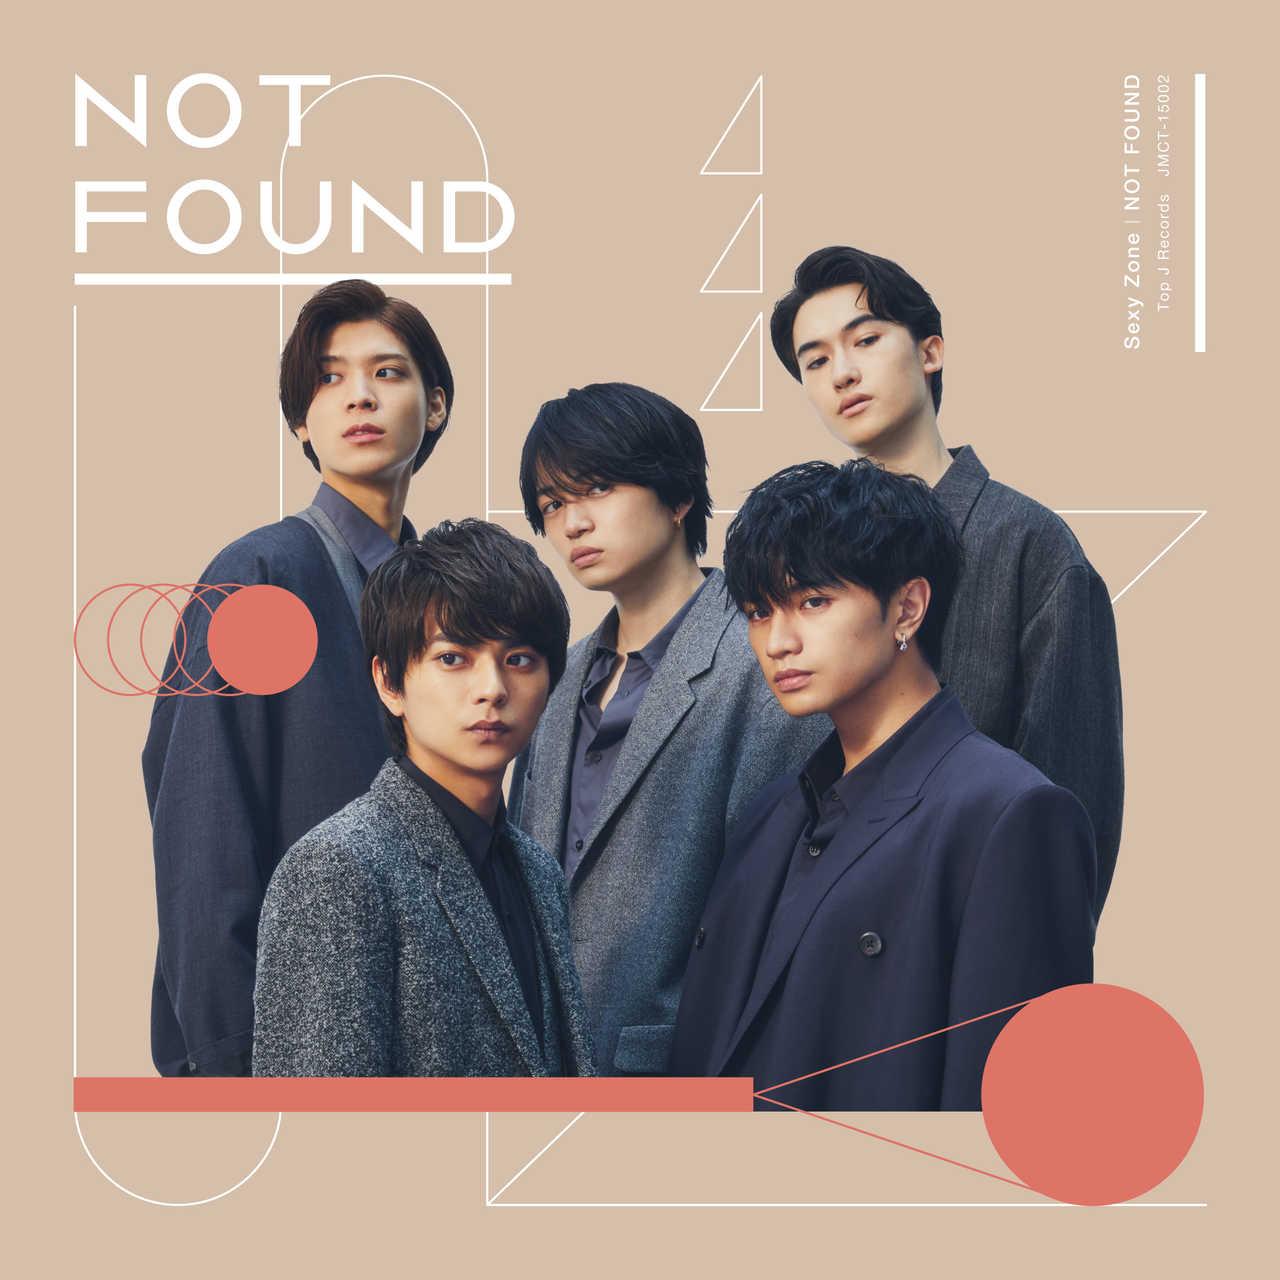 Sexy Zone 11月4日リリースシングル「NOT FOUND」MV解禁!